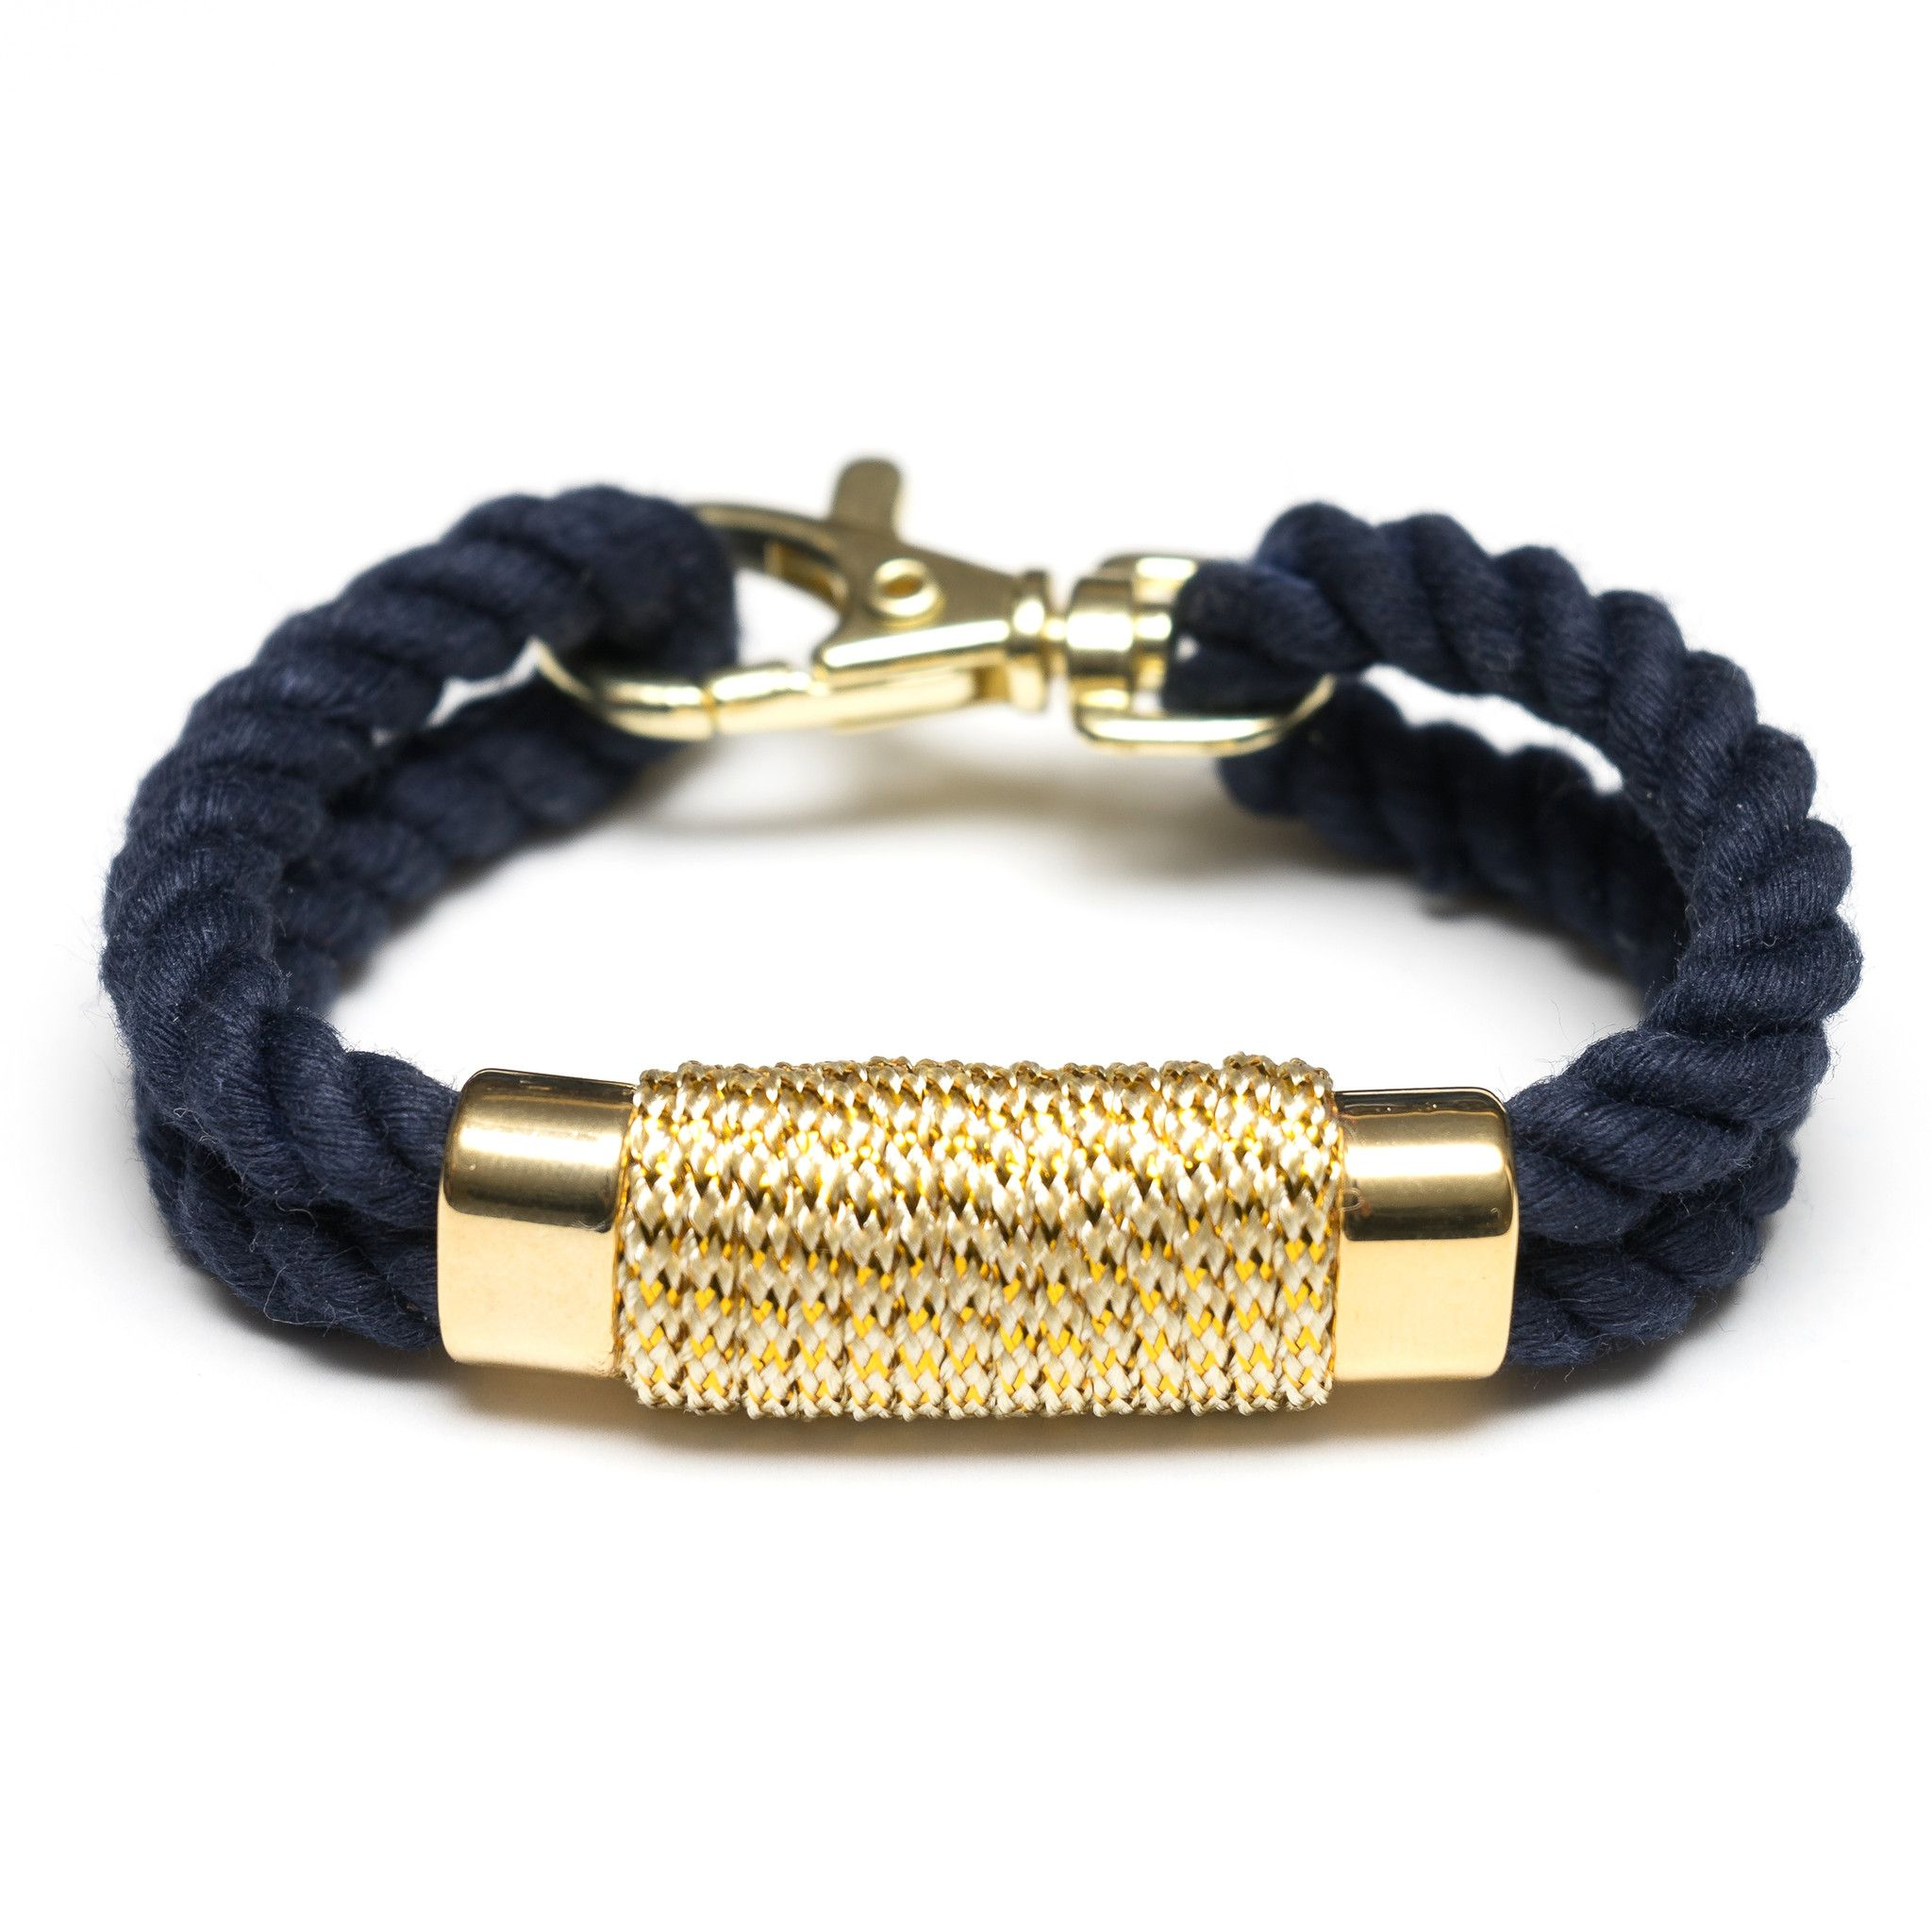 Tremont navymetallic gold metallic gold metallic and navy